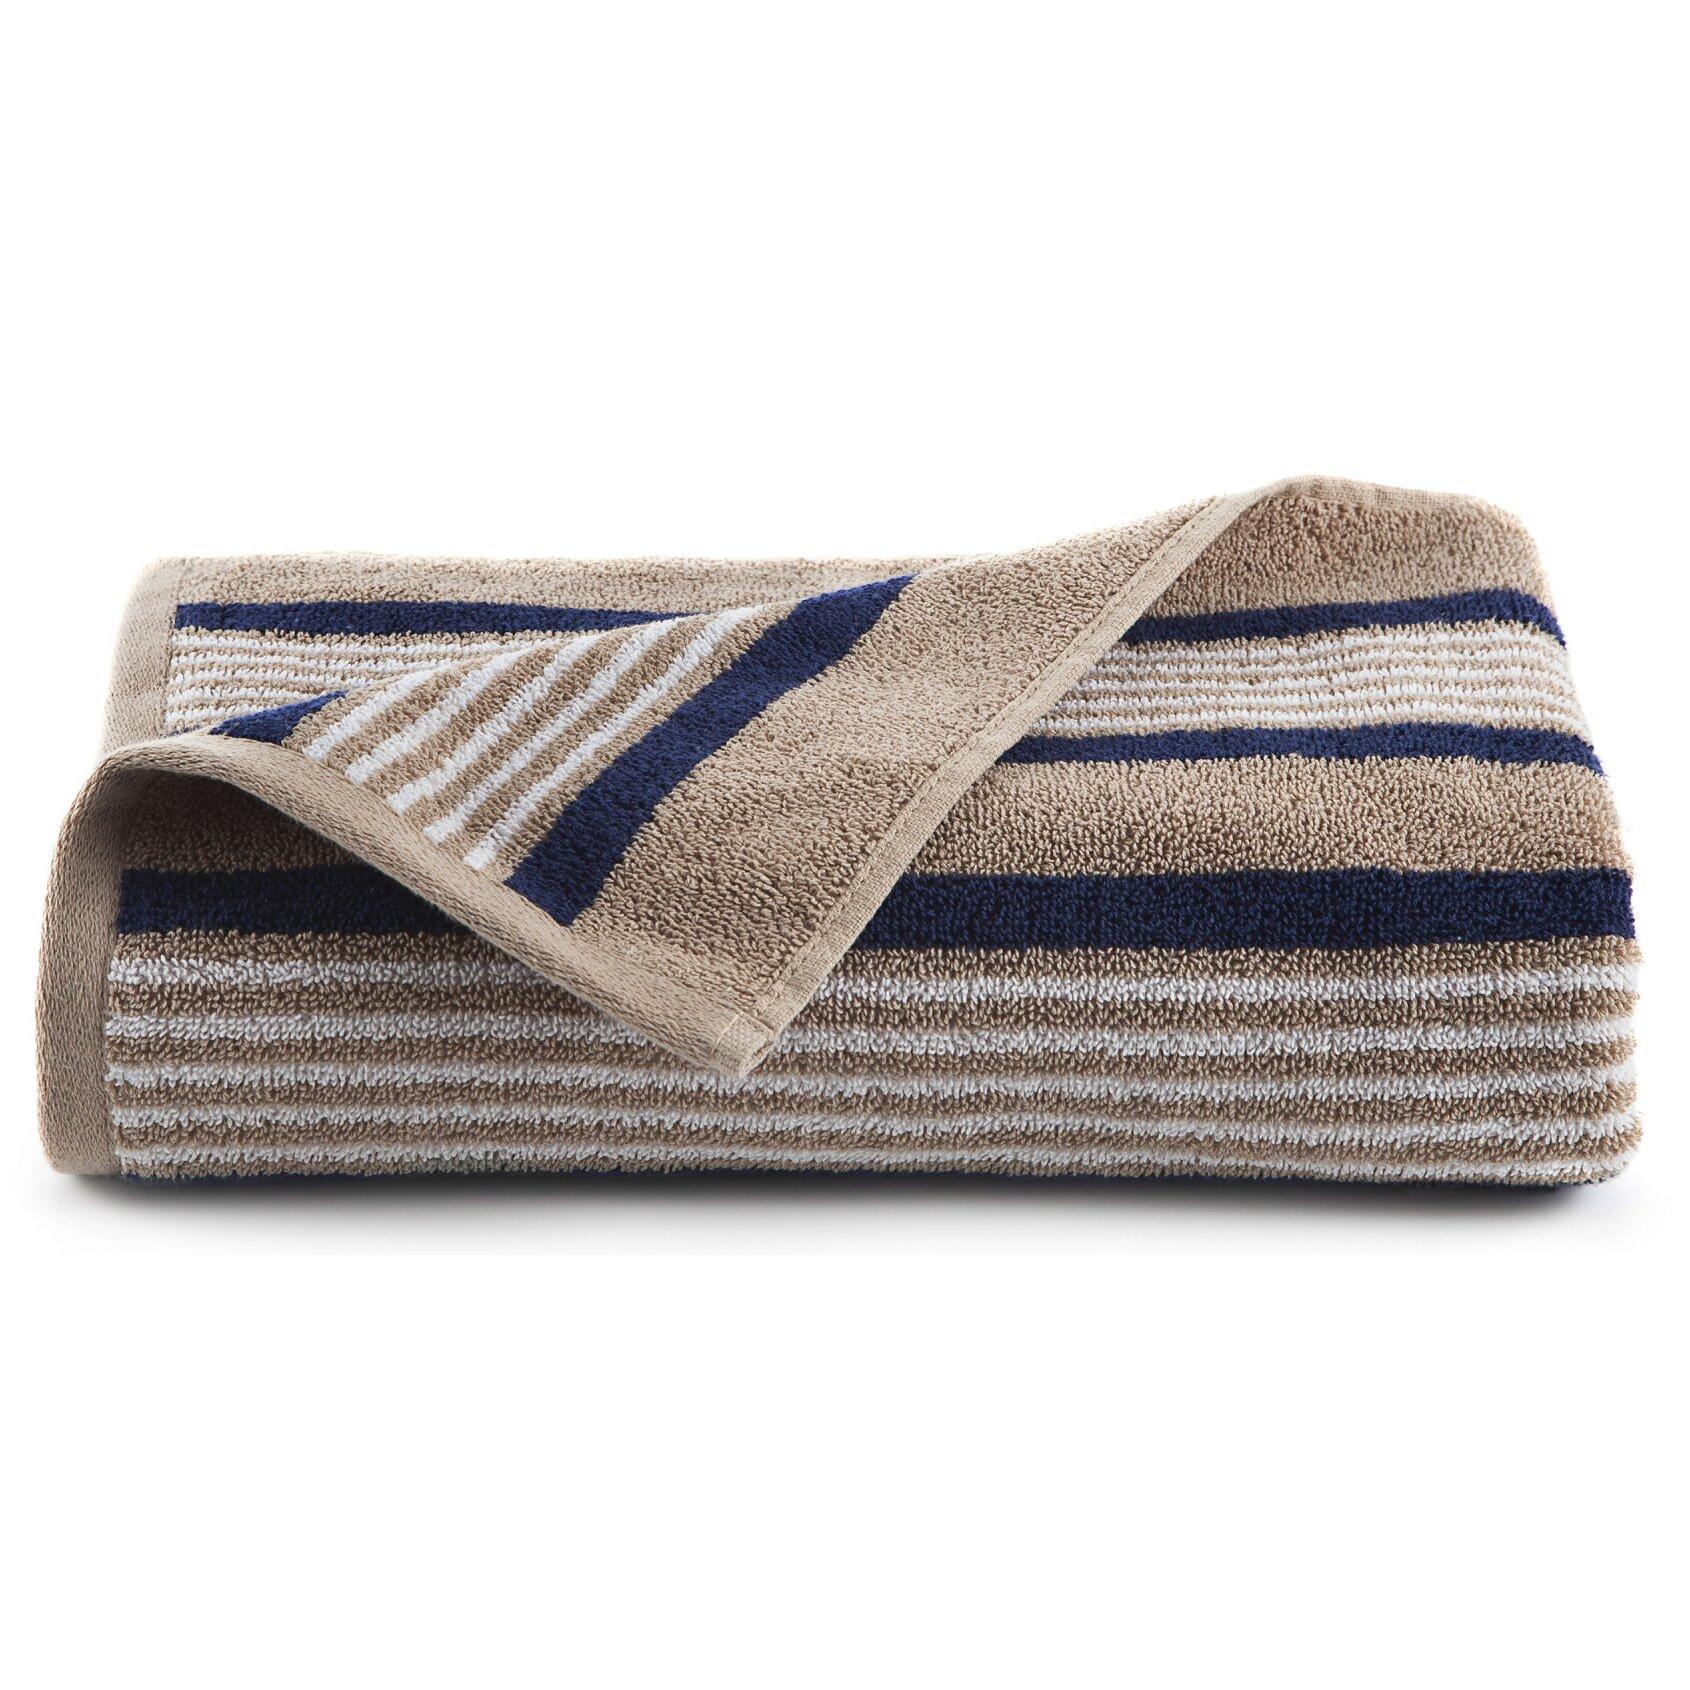 Bathroom Towels Striped: IZOD Racer Stripe Bath Towel & Reviews